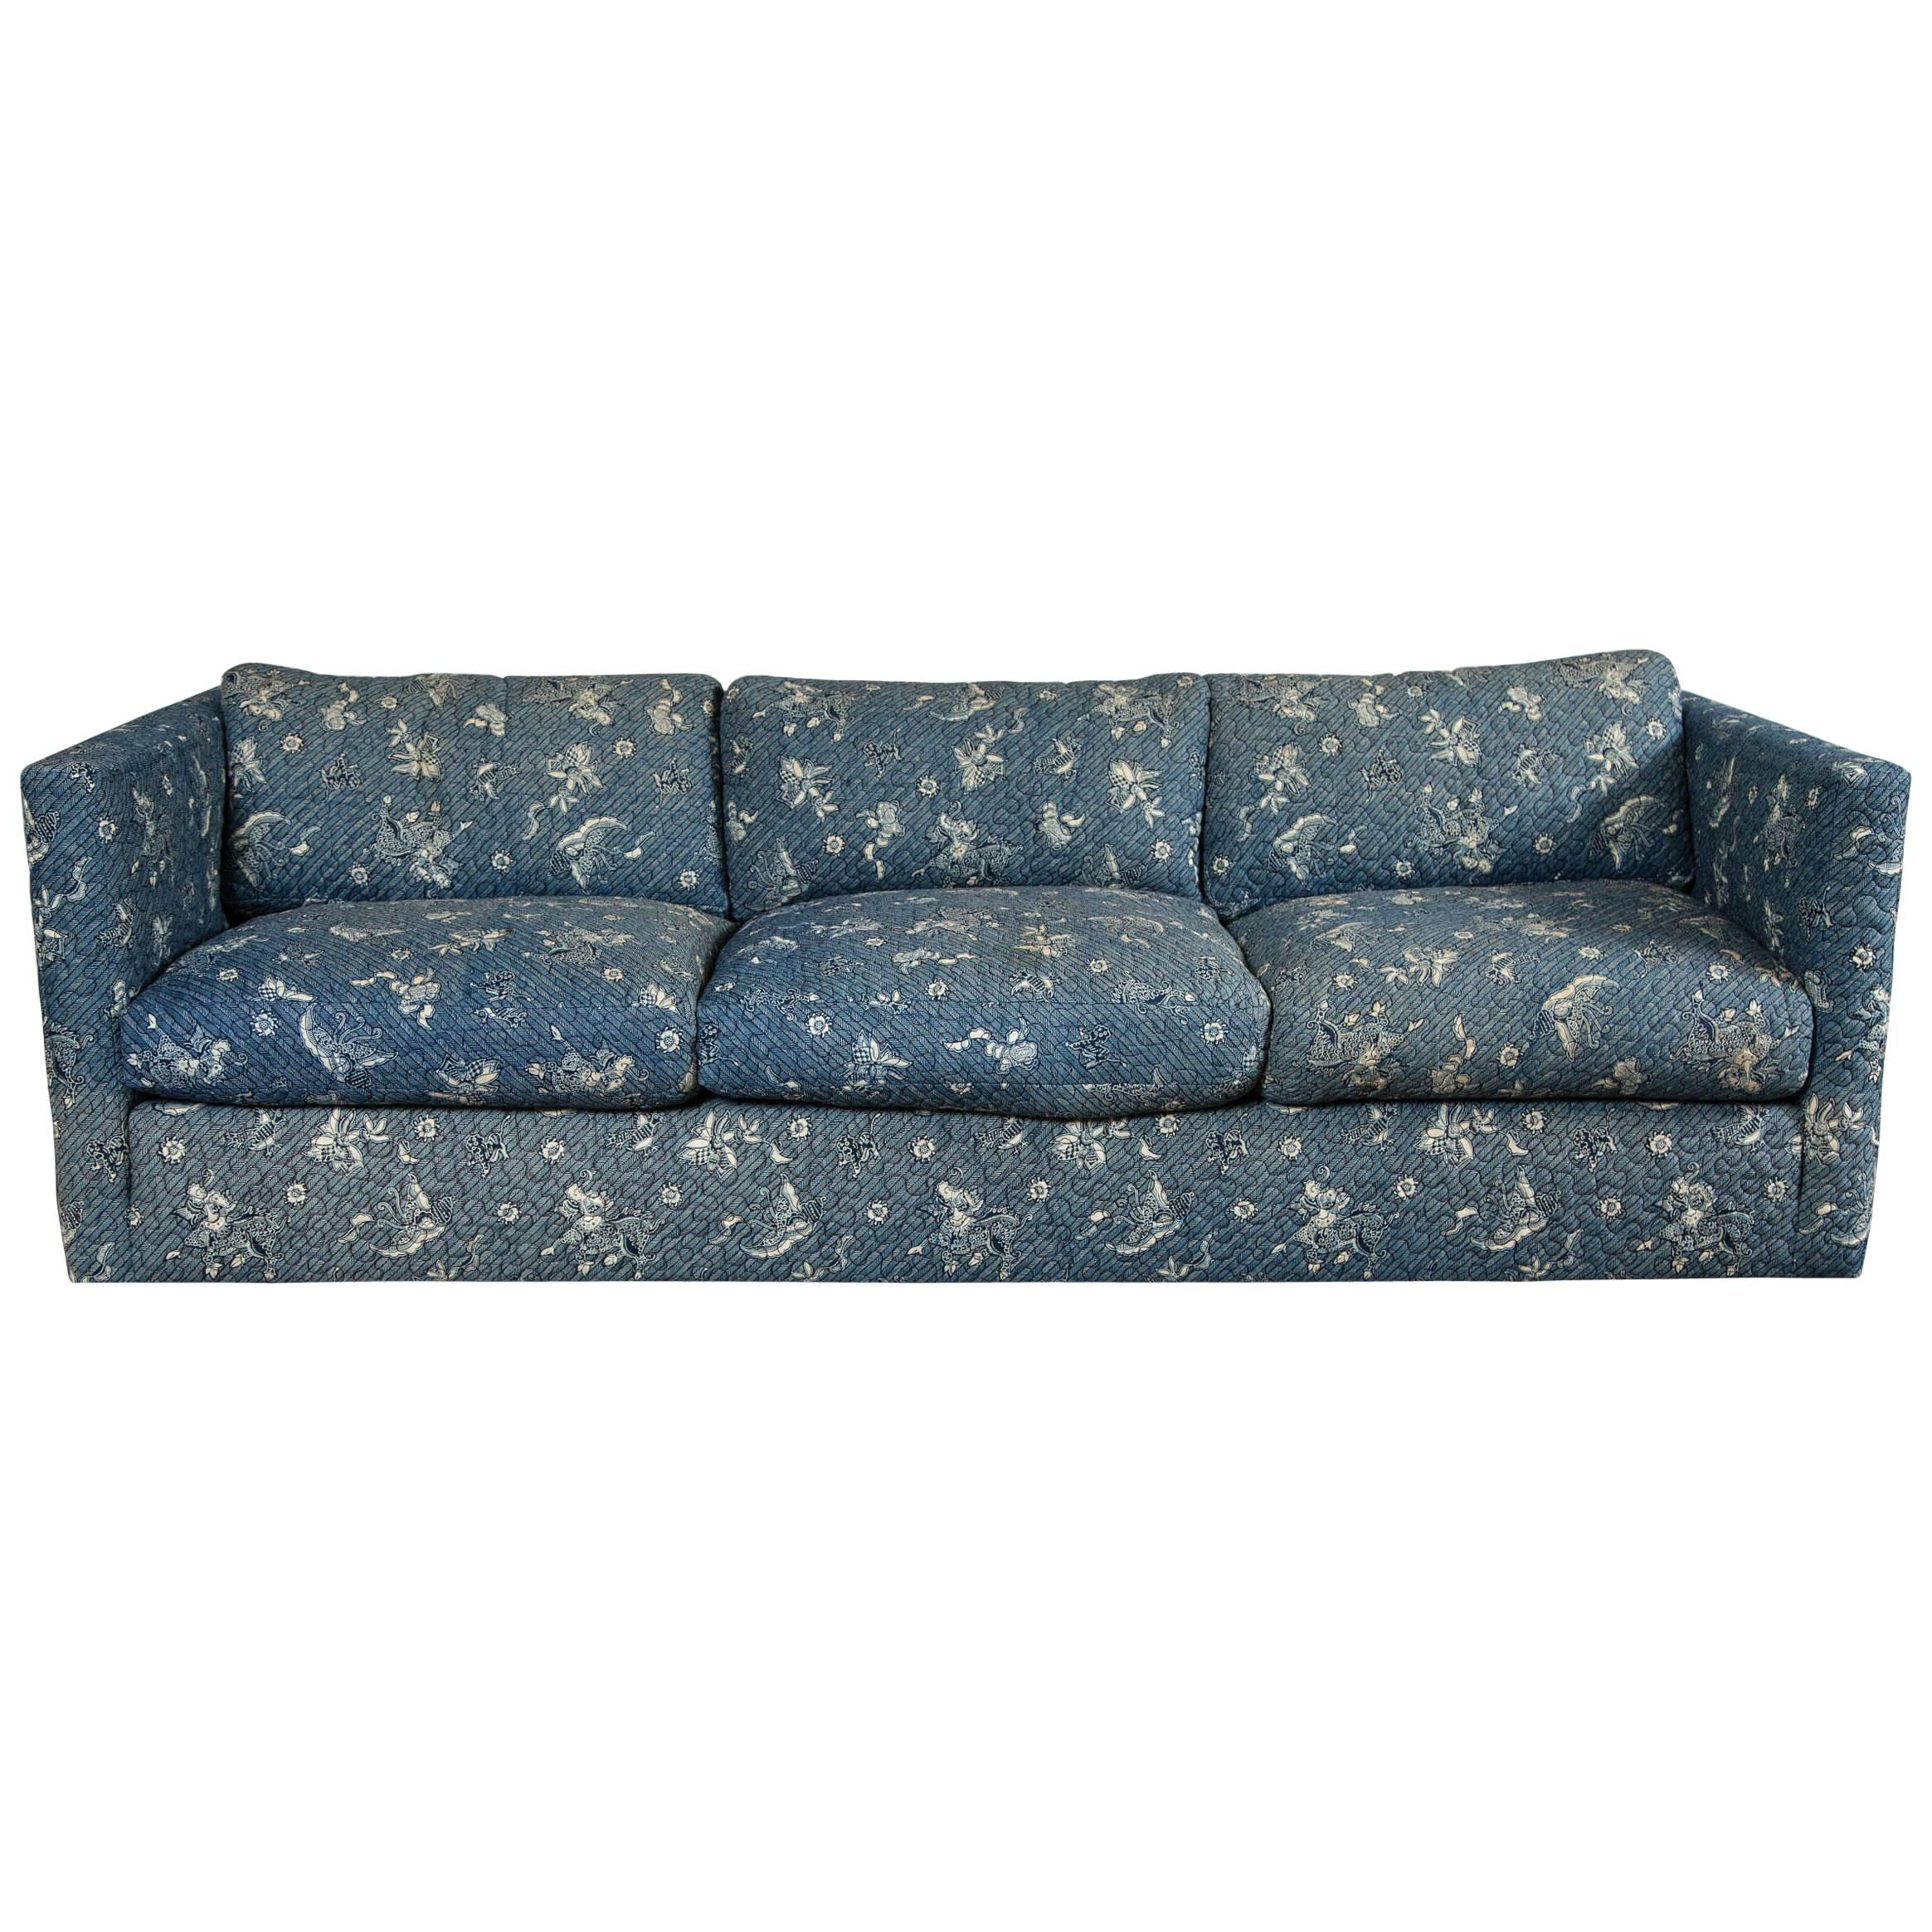 Milo Baughman Style Lawson Sofa For Sale